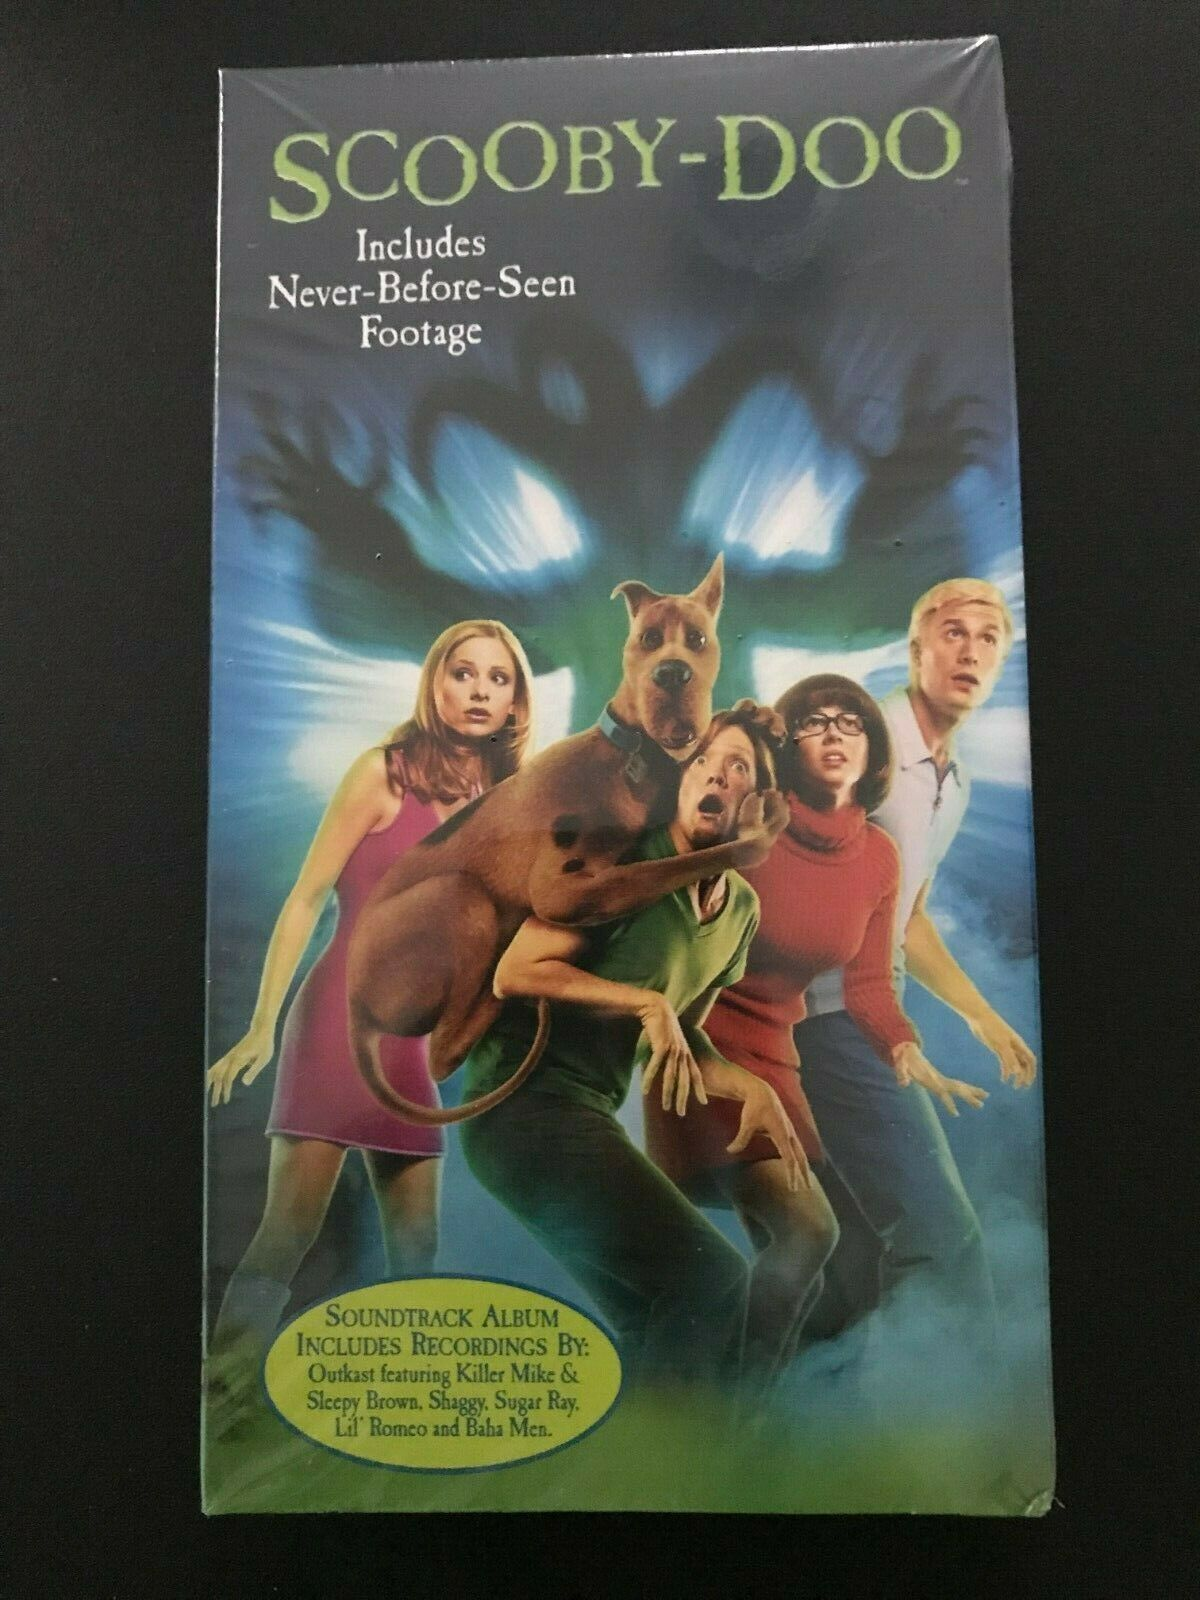 Scooby-Doo (2002 VHS)